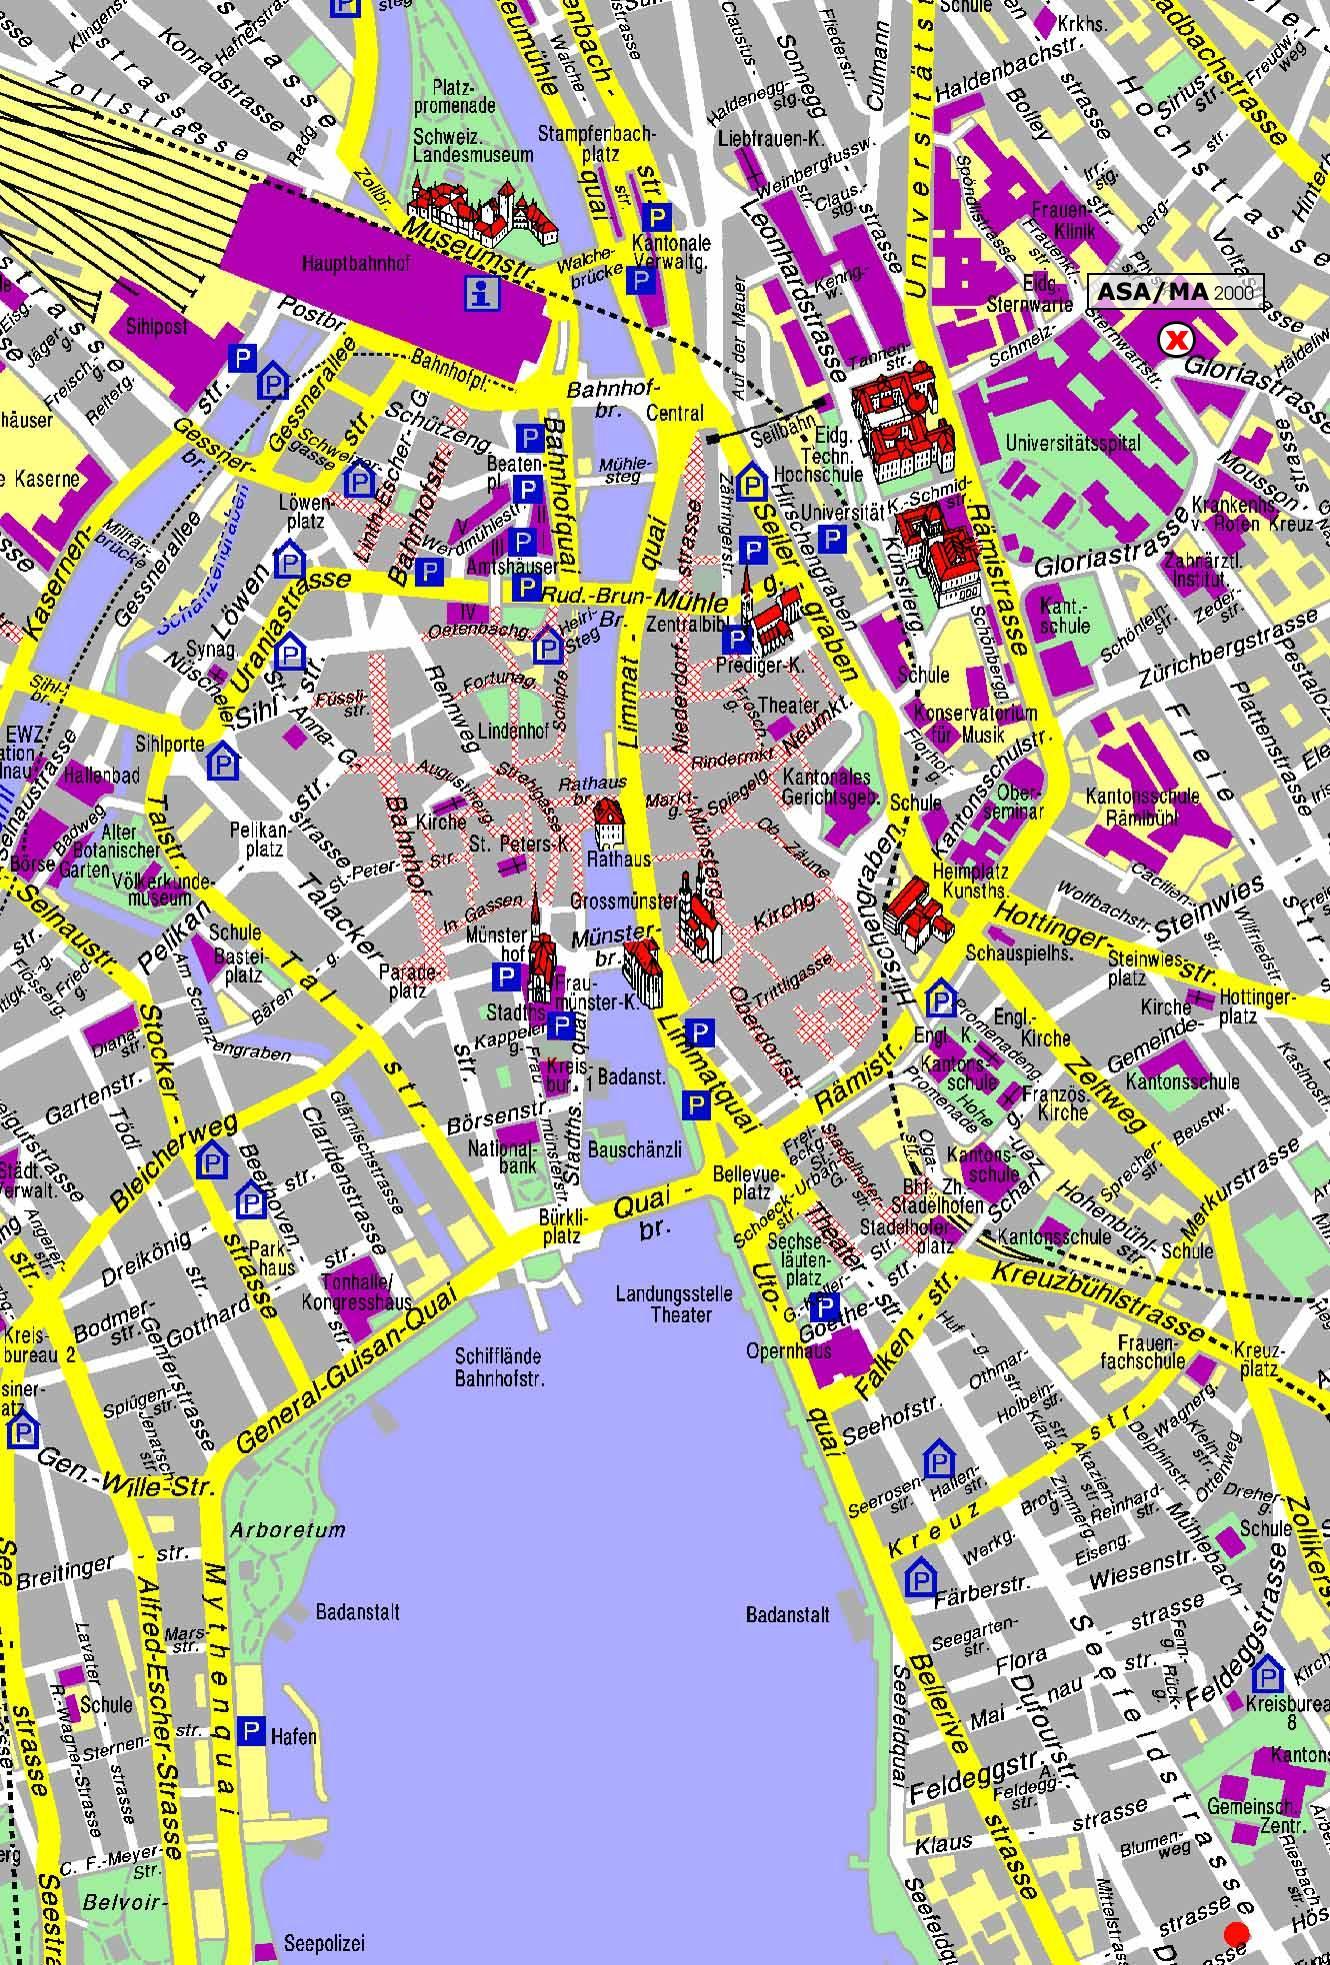 Map Of Zurich Zurich Map   Detailed City and Metro Maps of Zurich for Download  Map Of Zurich